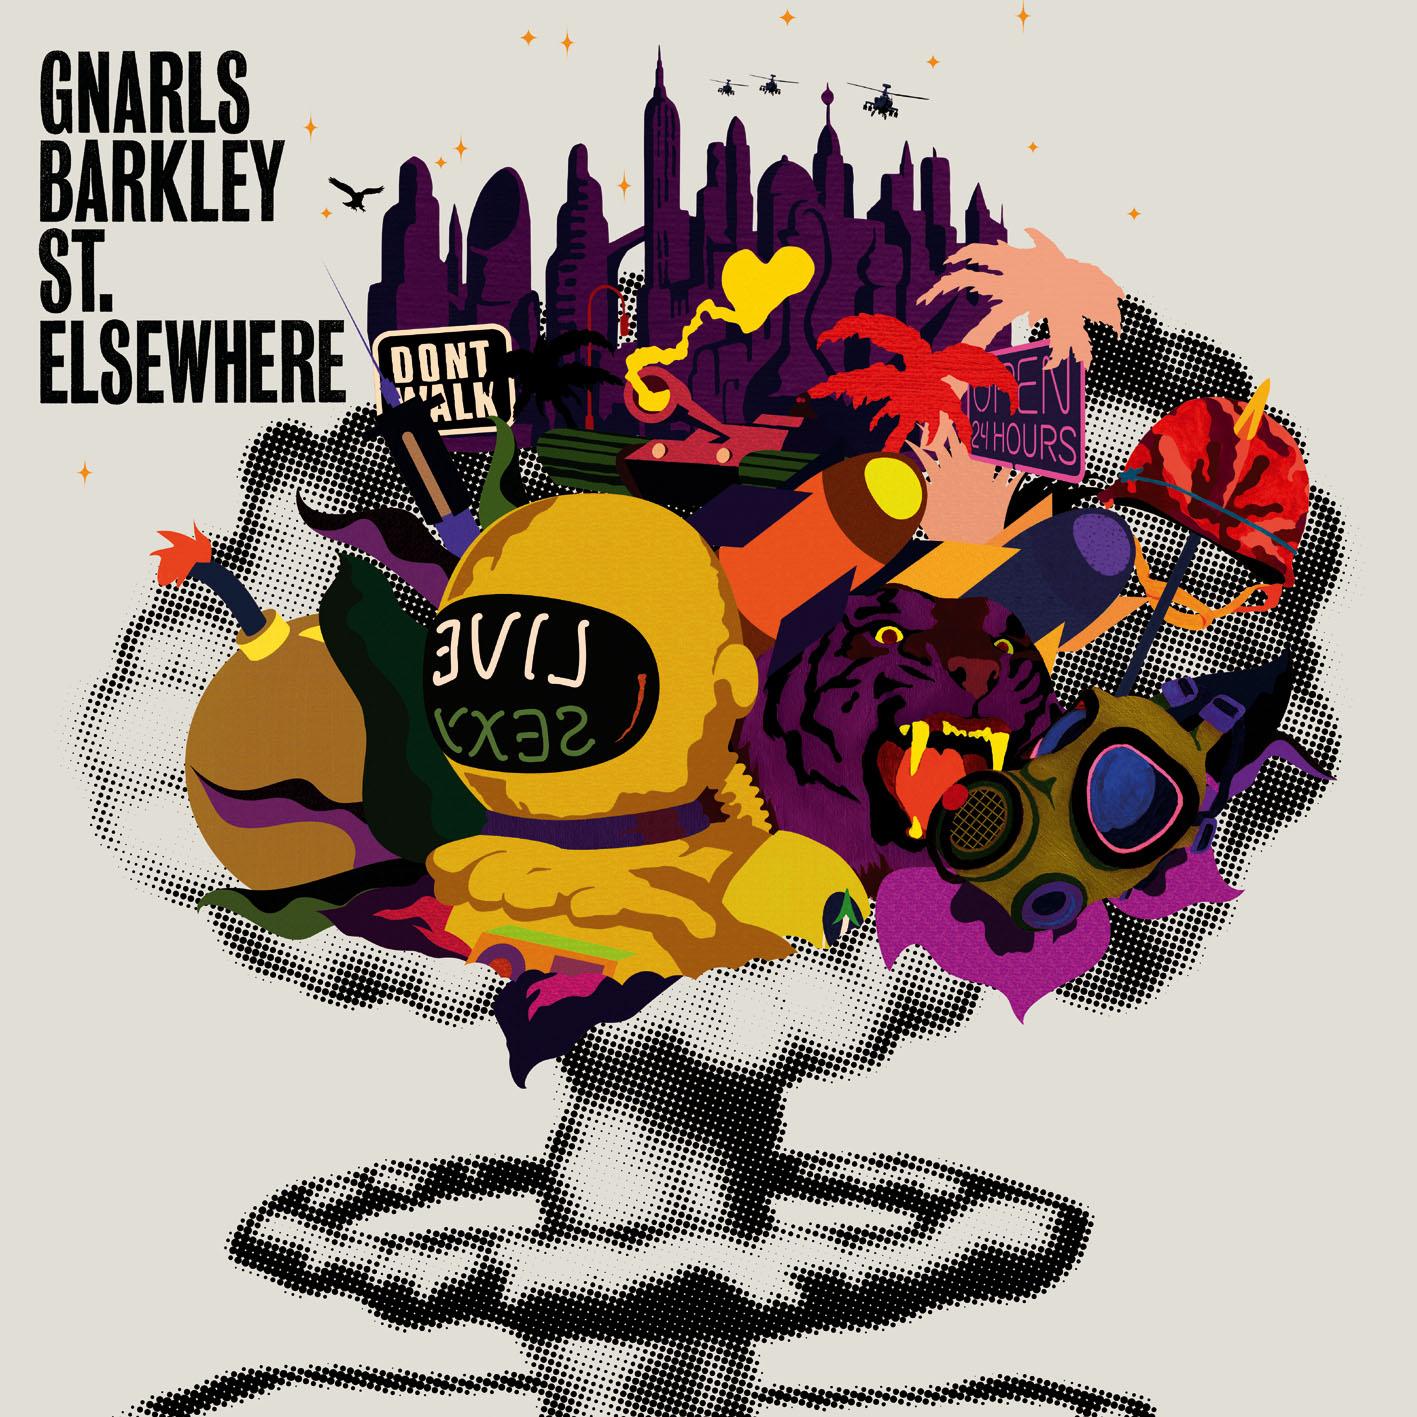 Gnarls Barkley, St. Elsewhere